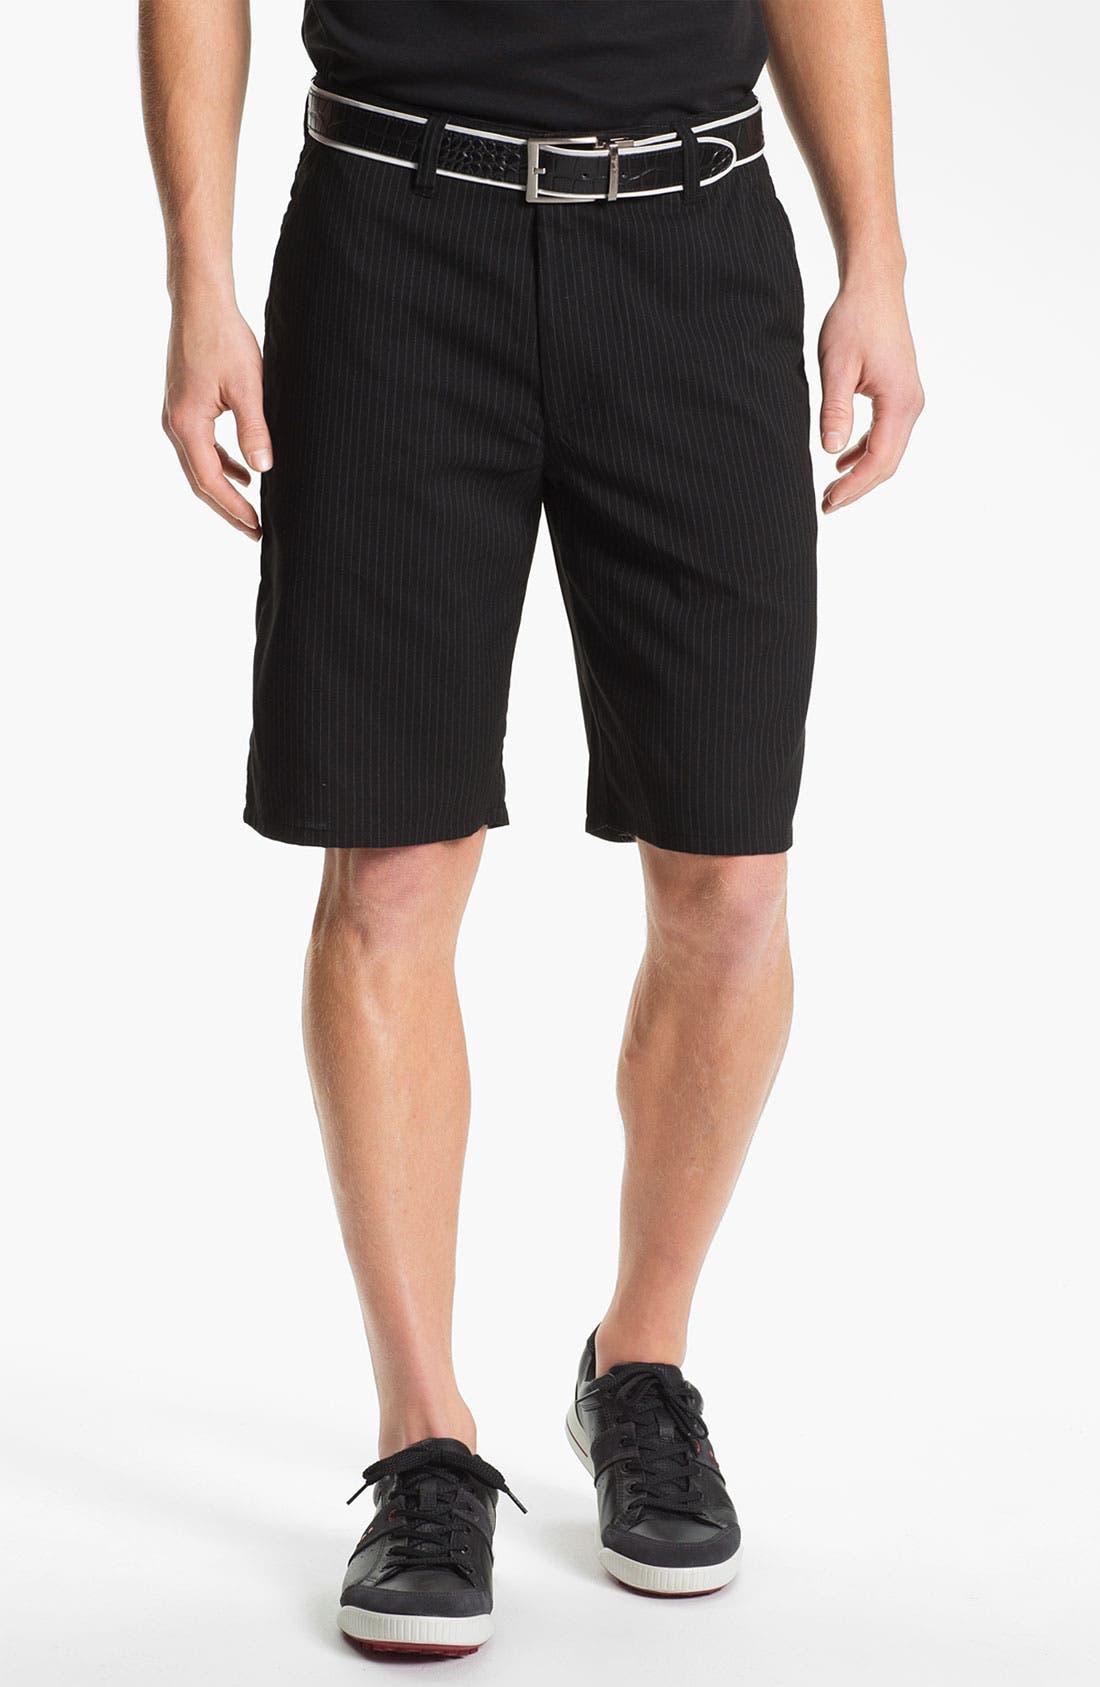 Main Image - Travis Mathew Flat Front Golf Shorts